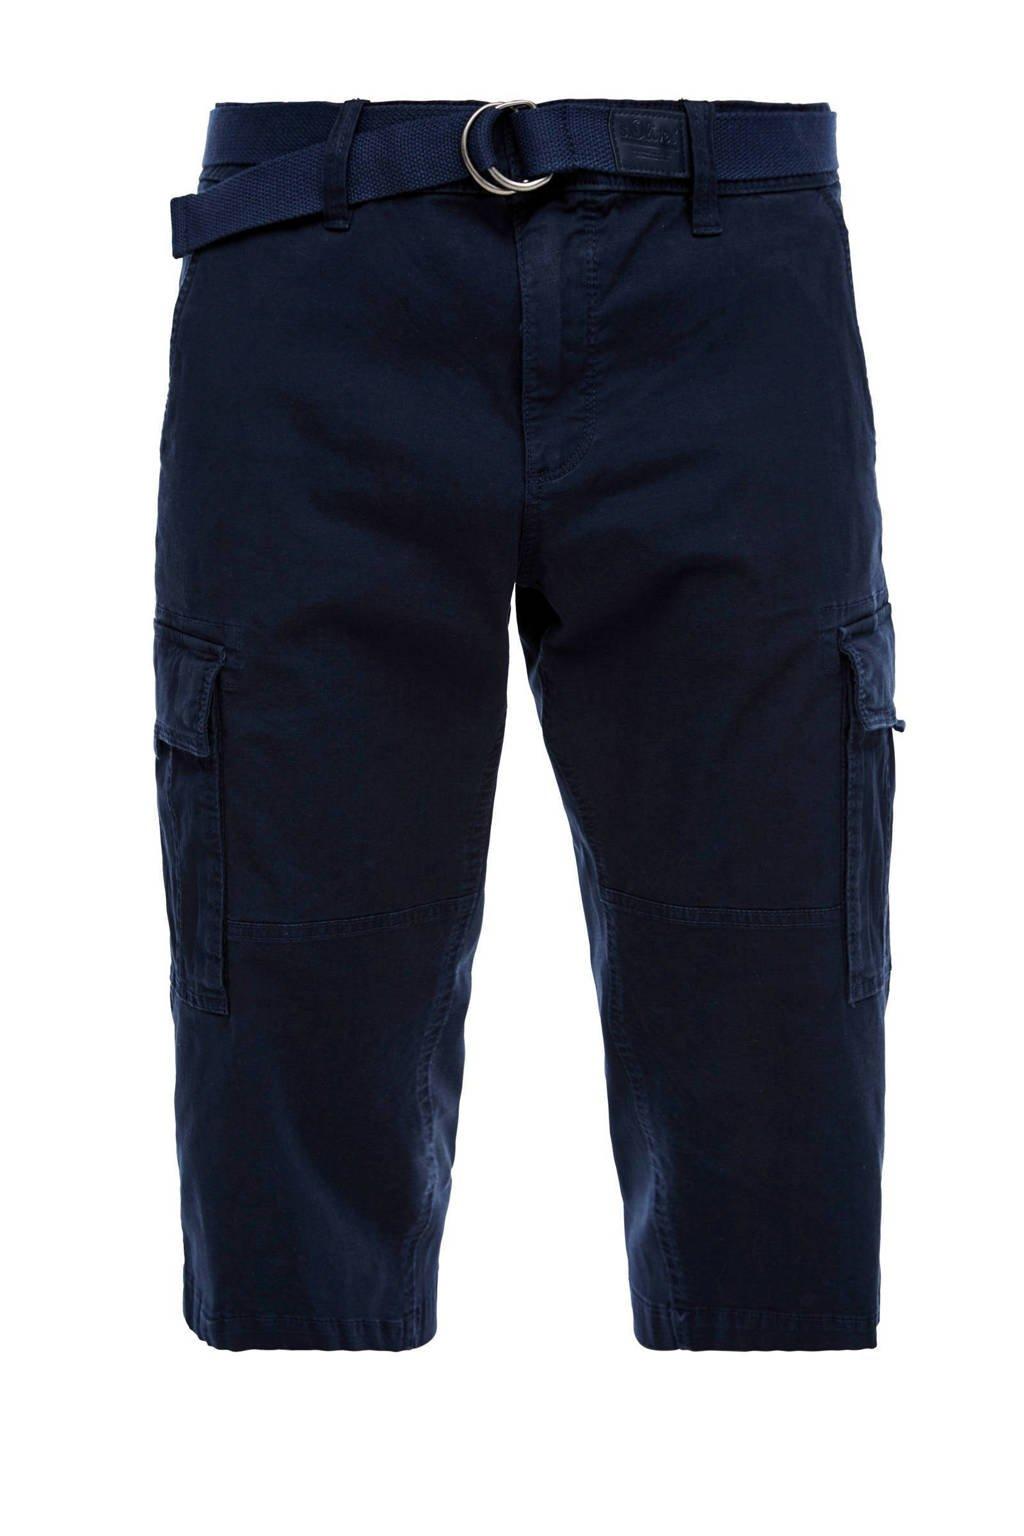 s.Oliver regular fit cargo bermuda donkerblauw, Donkerblauw